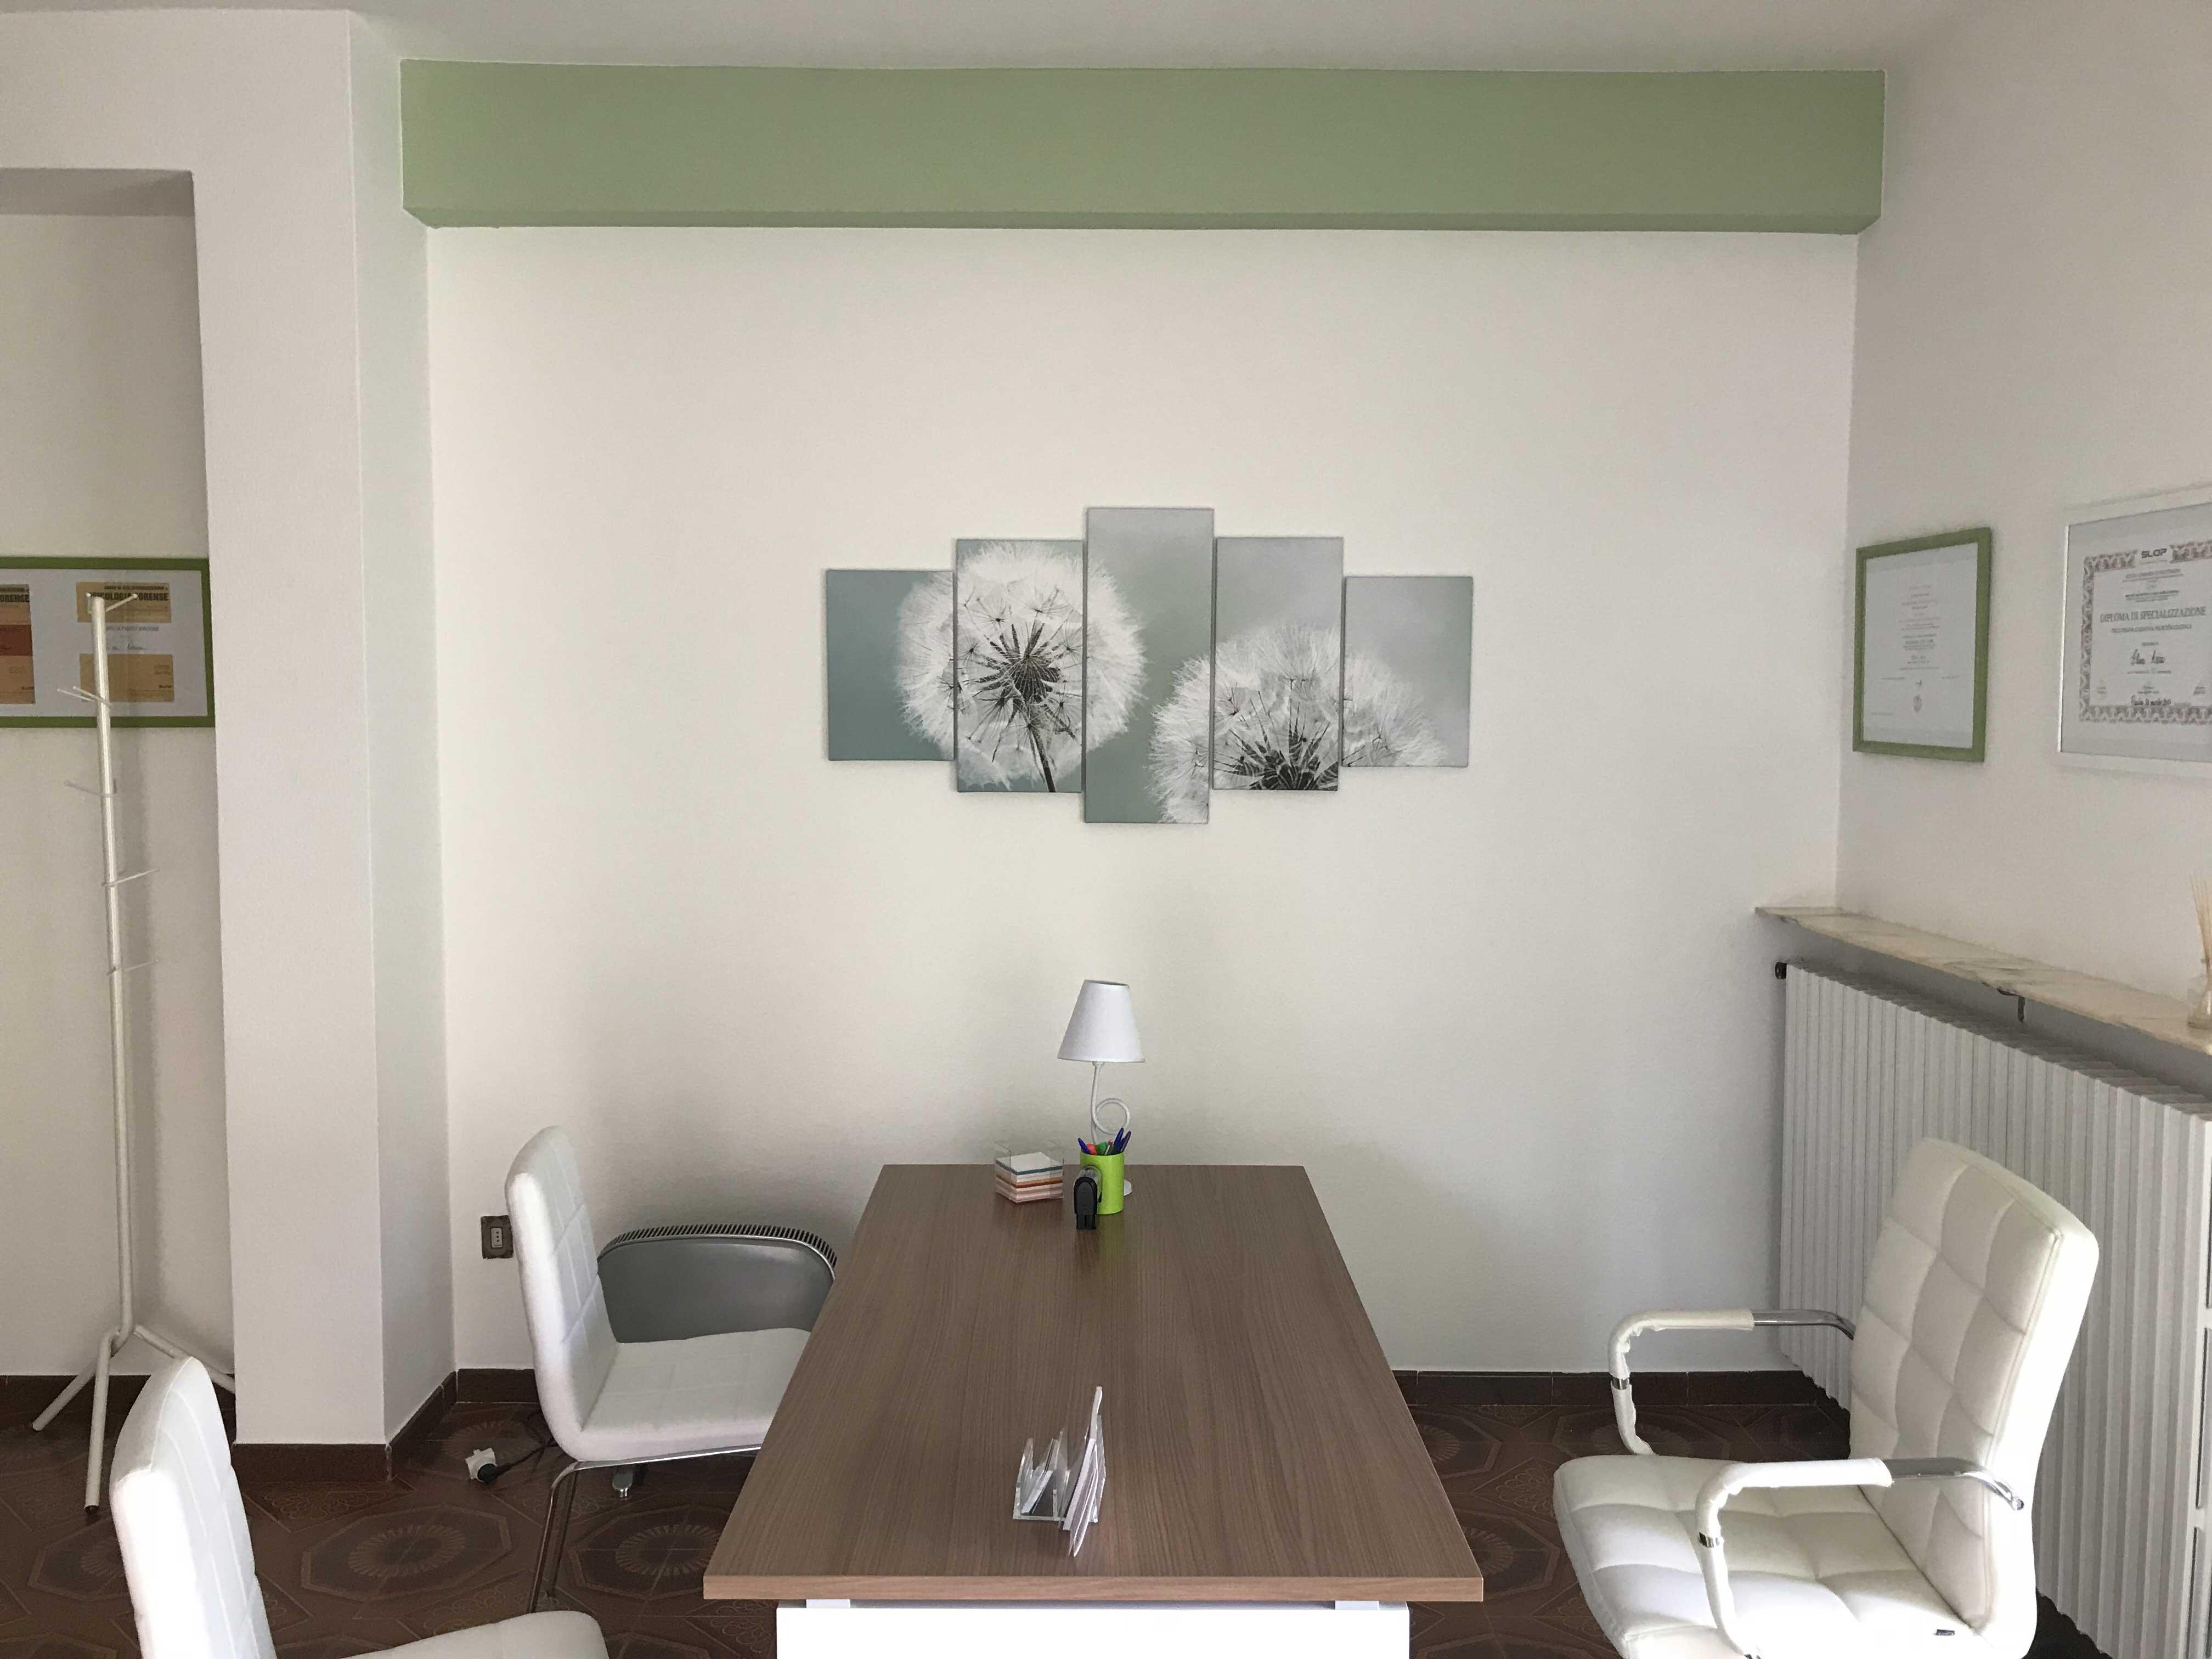 Studio-psicoterapeuta-quadro-Arca